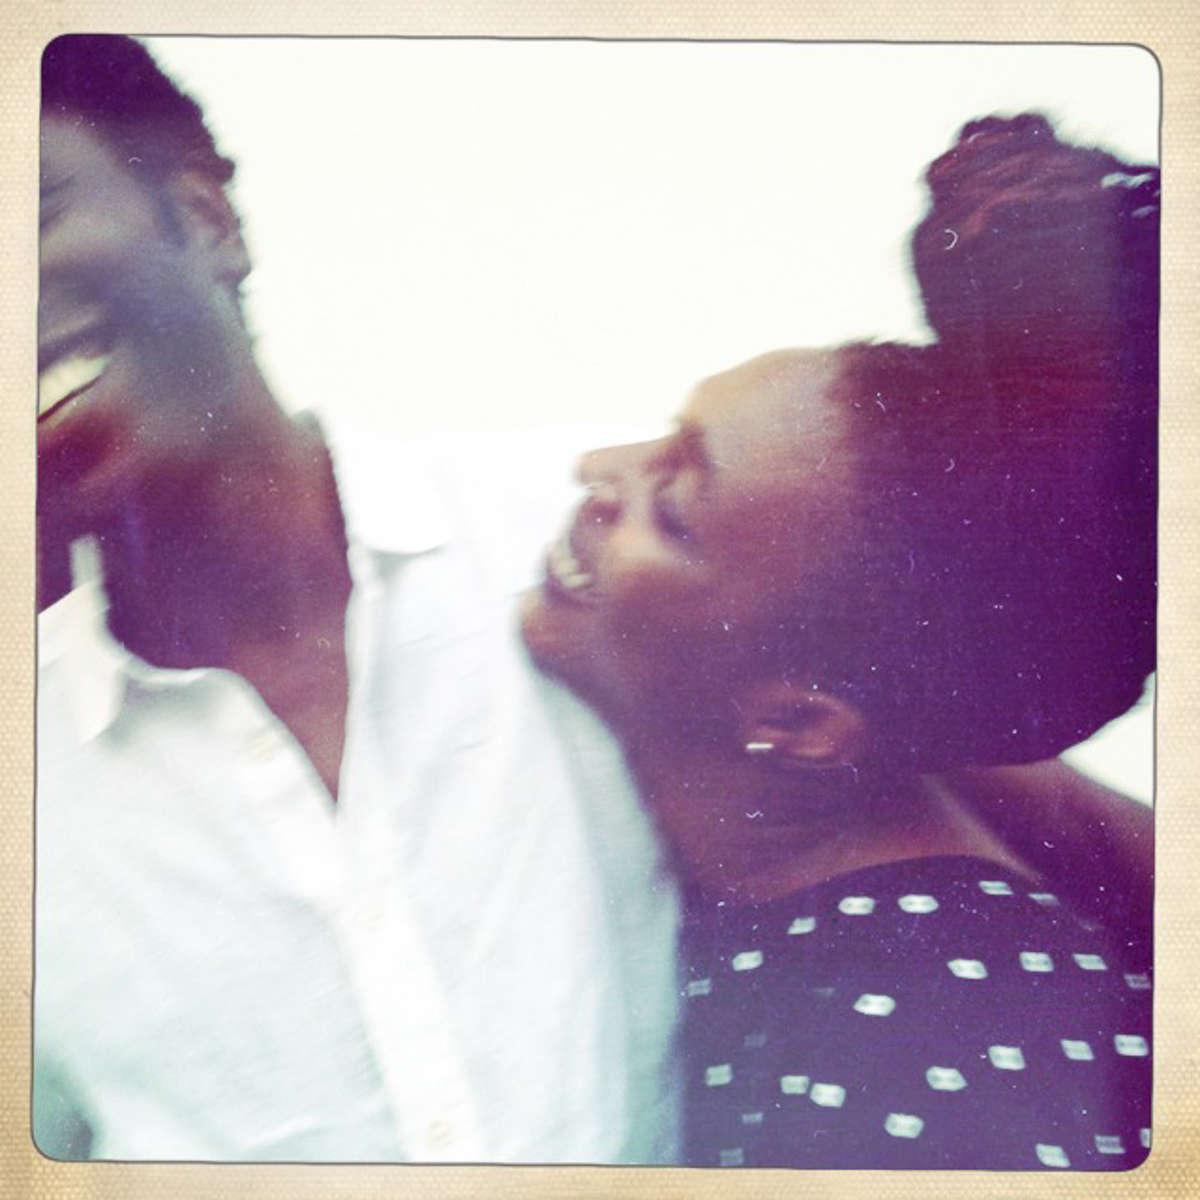 Hauwa and Femi on their one year wedding anniversary. Lagos, Nigeria. January 2013.